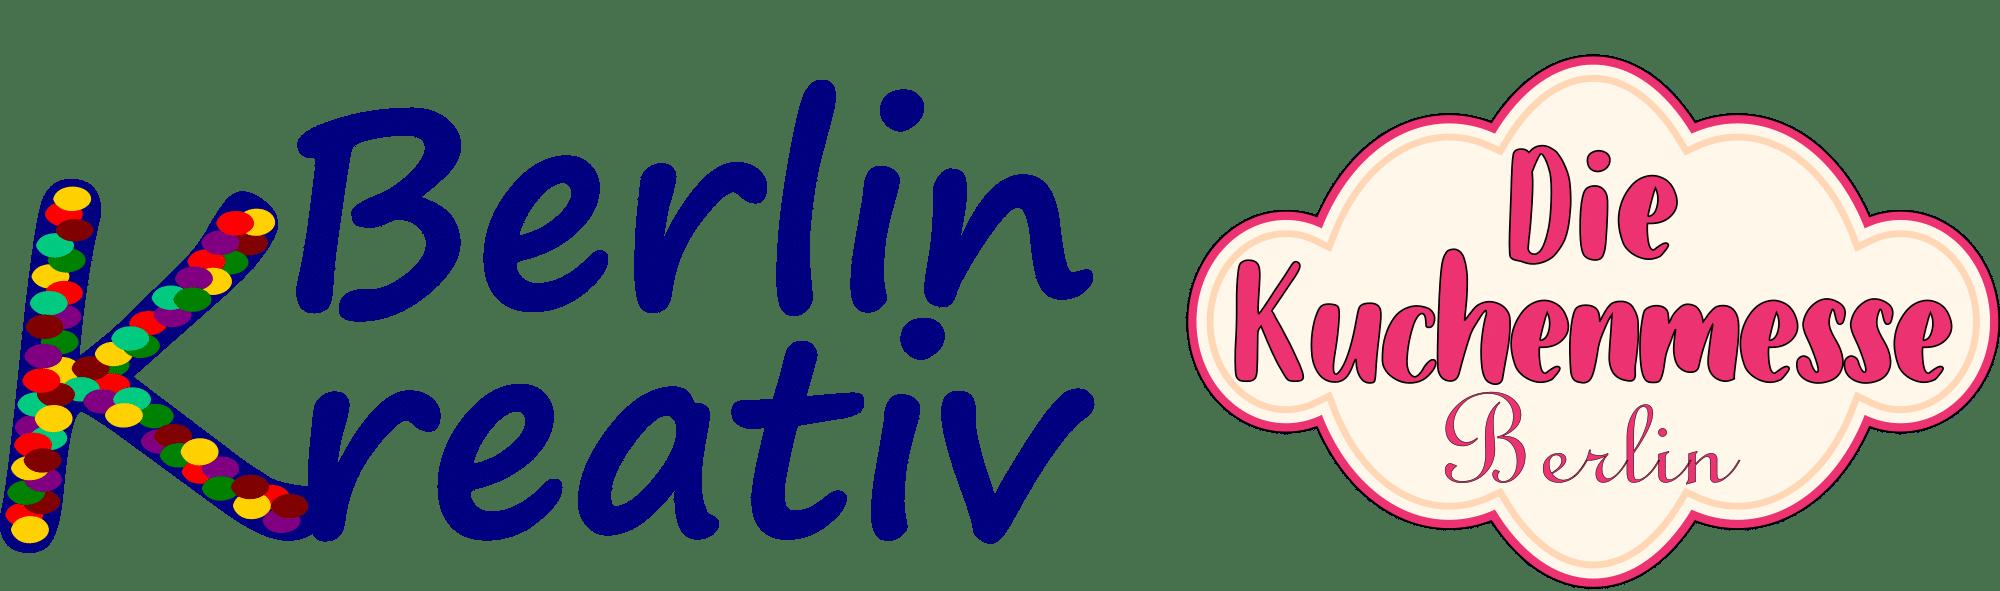 BerlinKreativ Messe